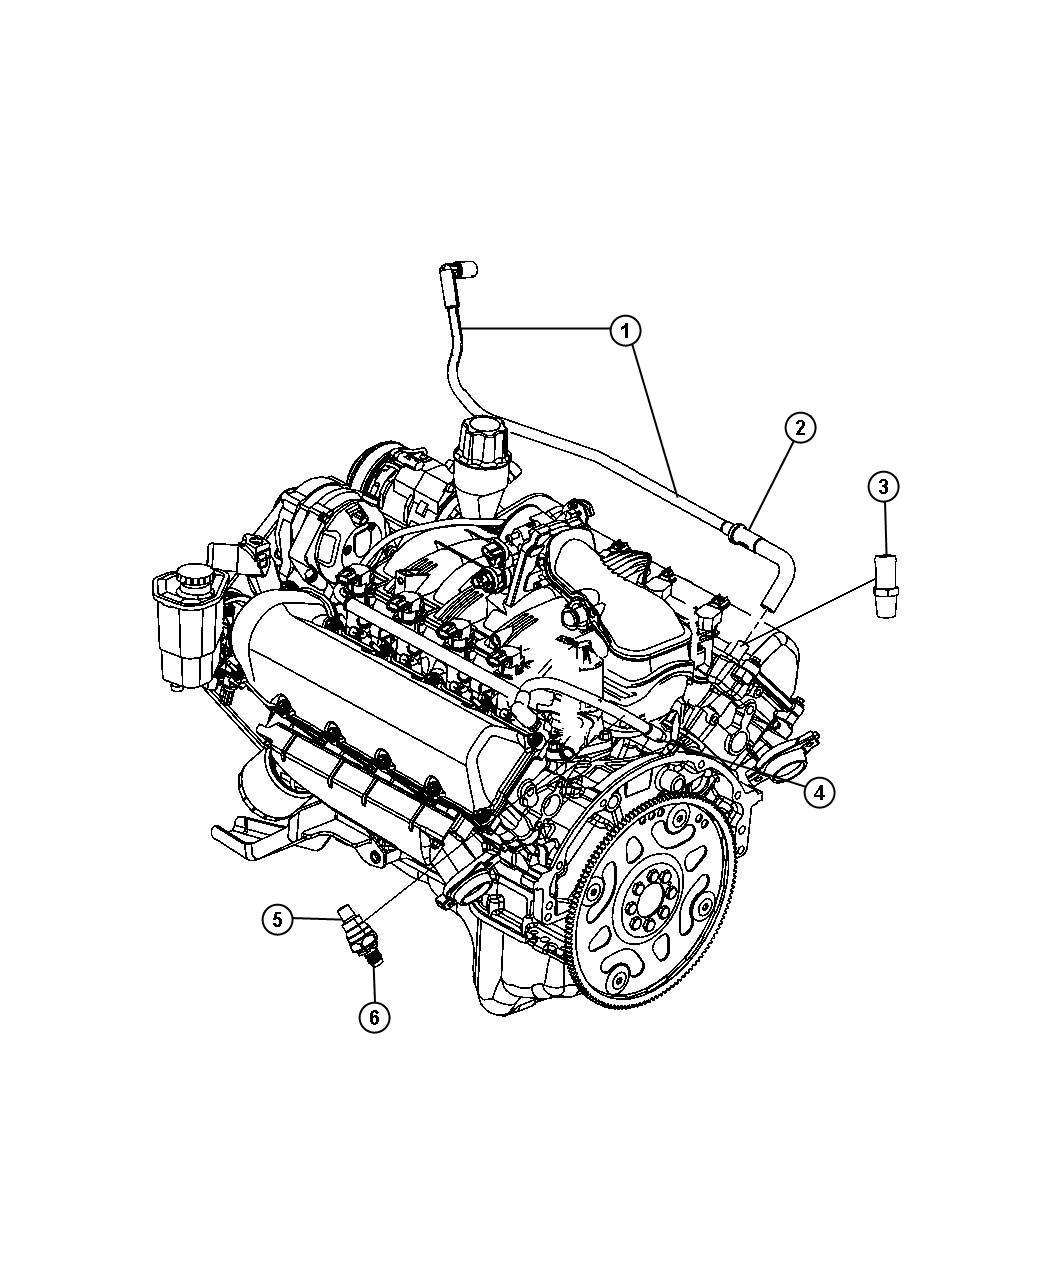 Chrysler Aspen Used For Pcv Valve And Housing Valve Crankcase Vent Adapter Assembly